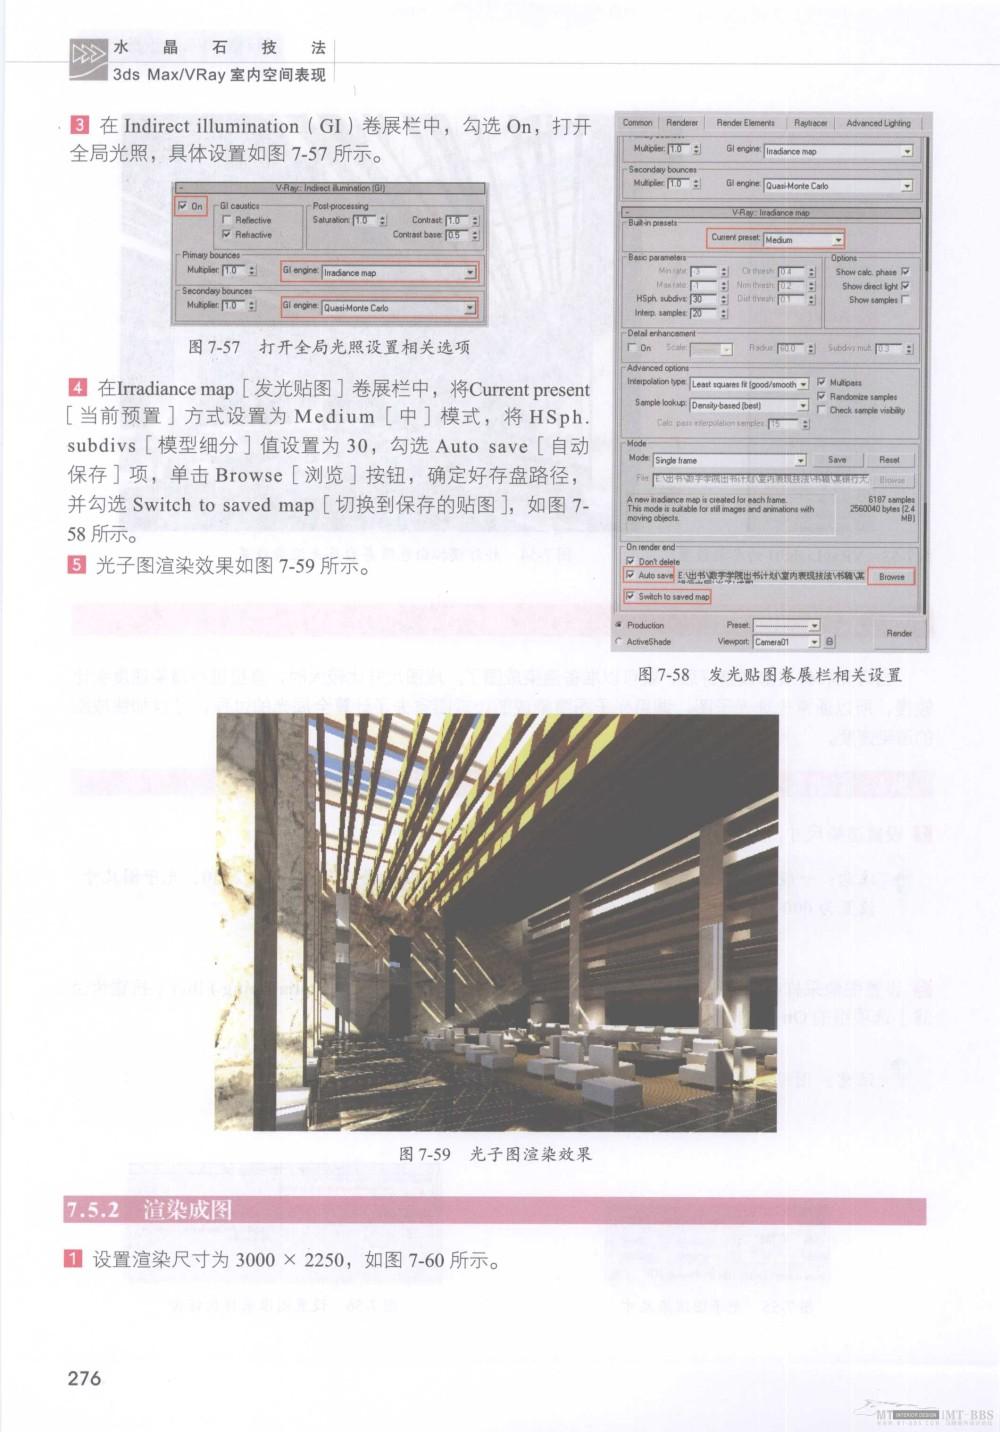 水晶石技法-3ds_Max&VRay室内空间表现_水晶石技法-3ds_Max&VRay室内空间表现_页面_282.jpg